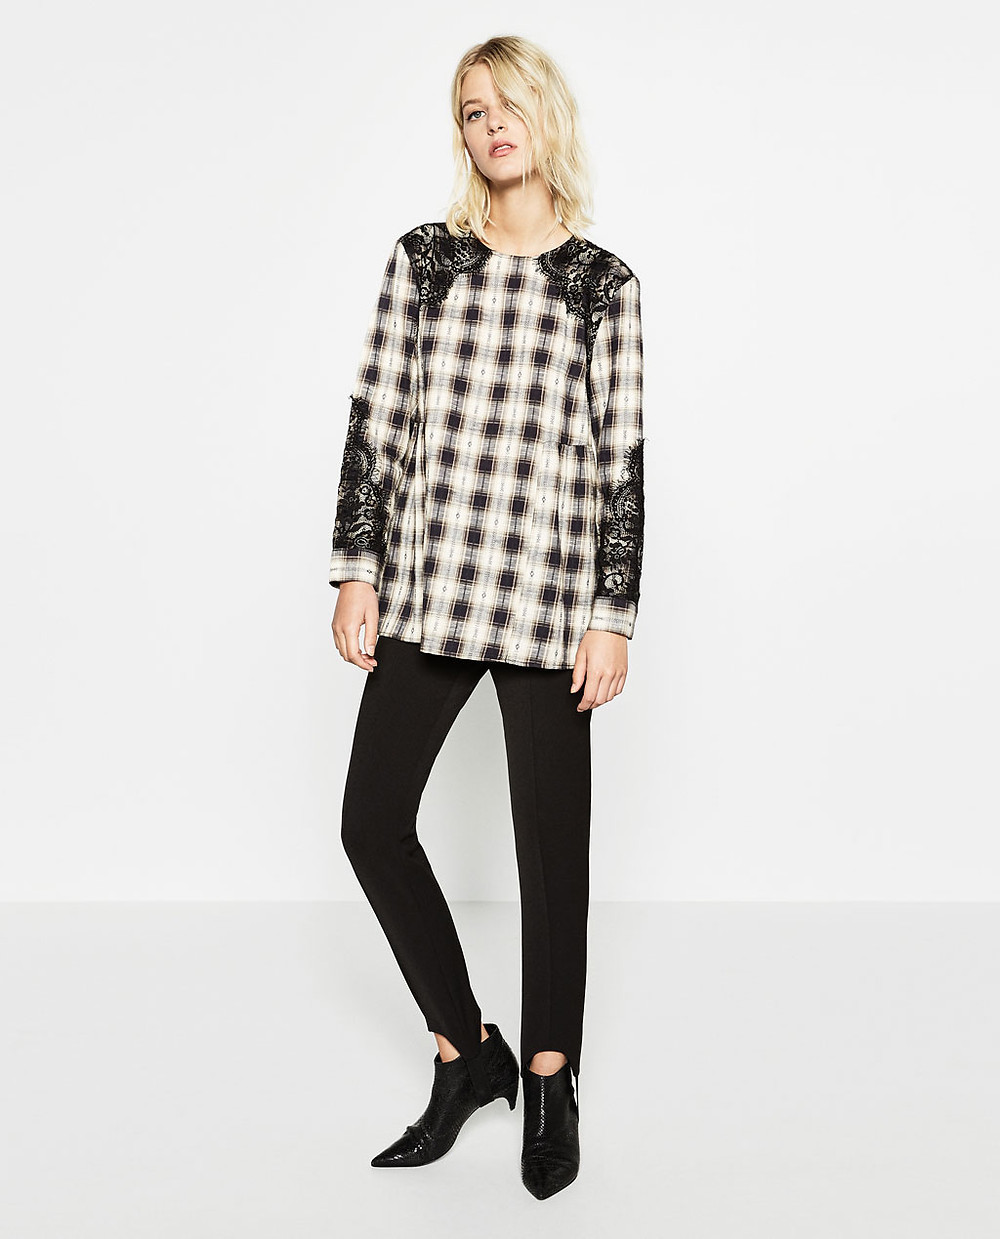 Zara Checked Tunic $49.90